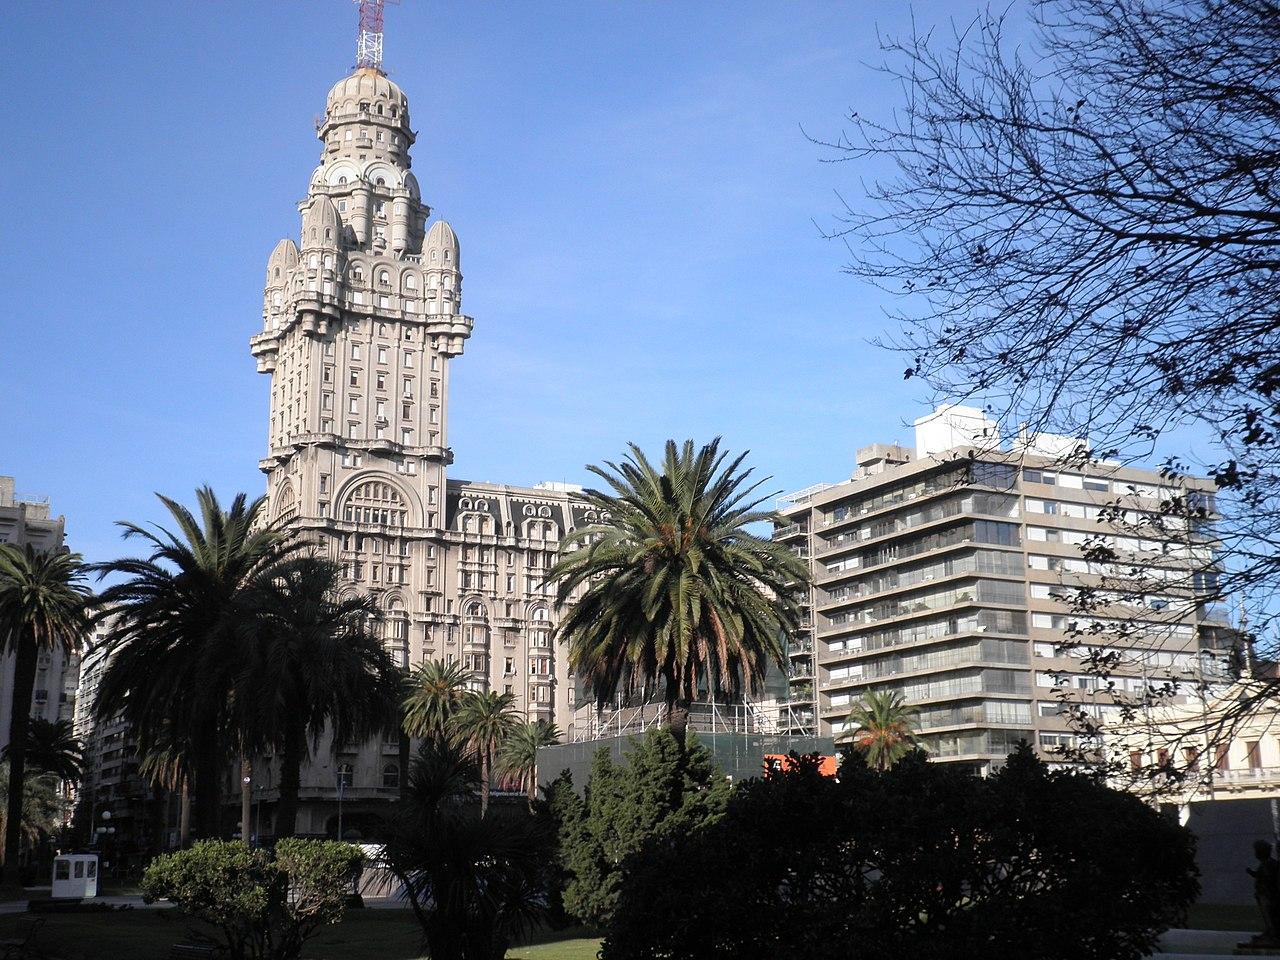 File:Salvo Palace, Montevideo,Uruguay.jpg - Wikimedia Commons